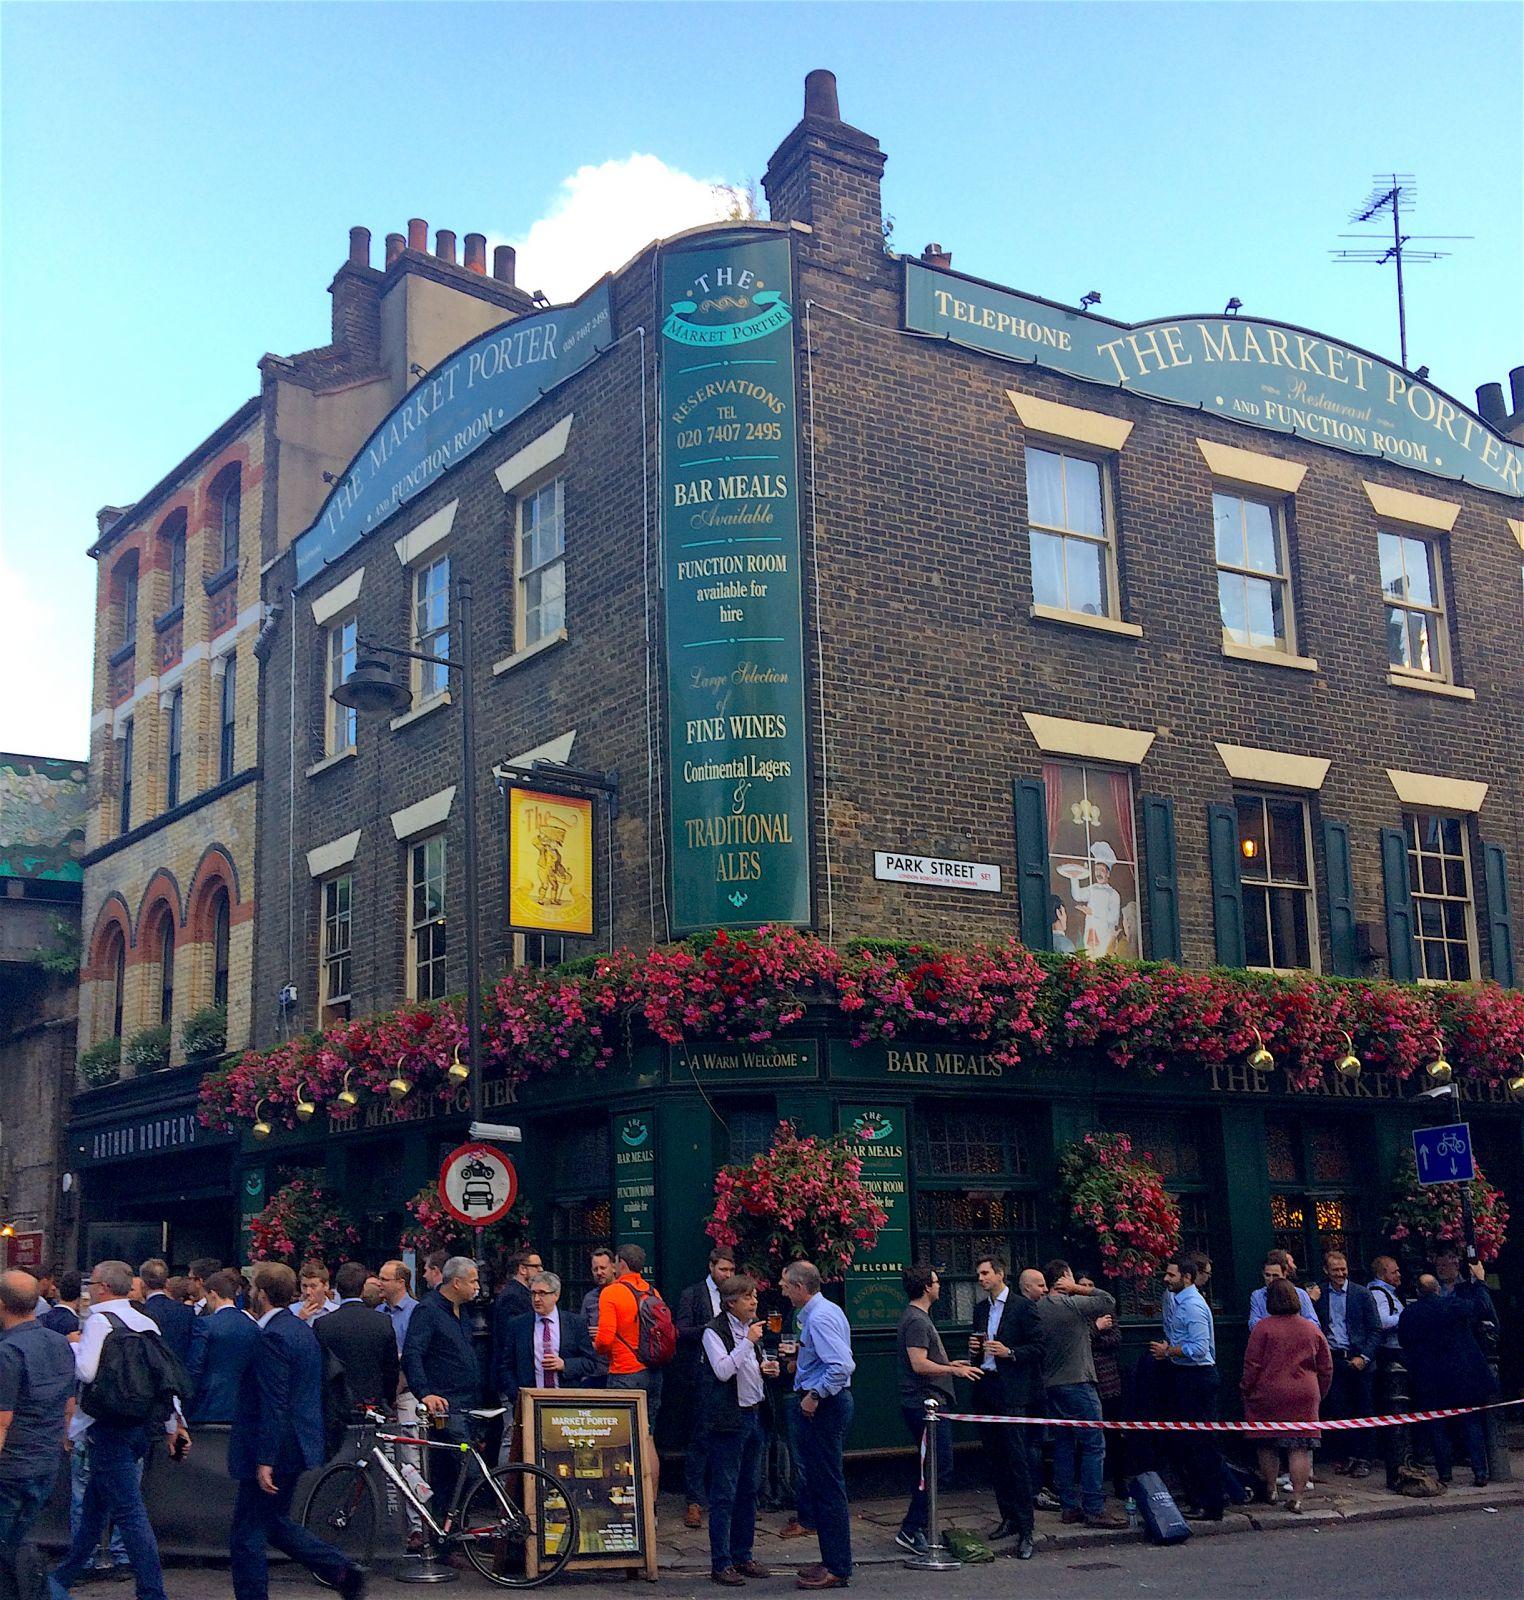 borough-market-london-market-porter-bar